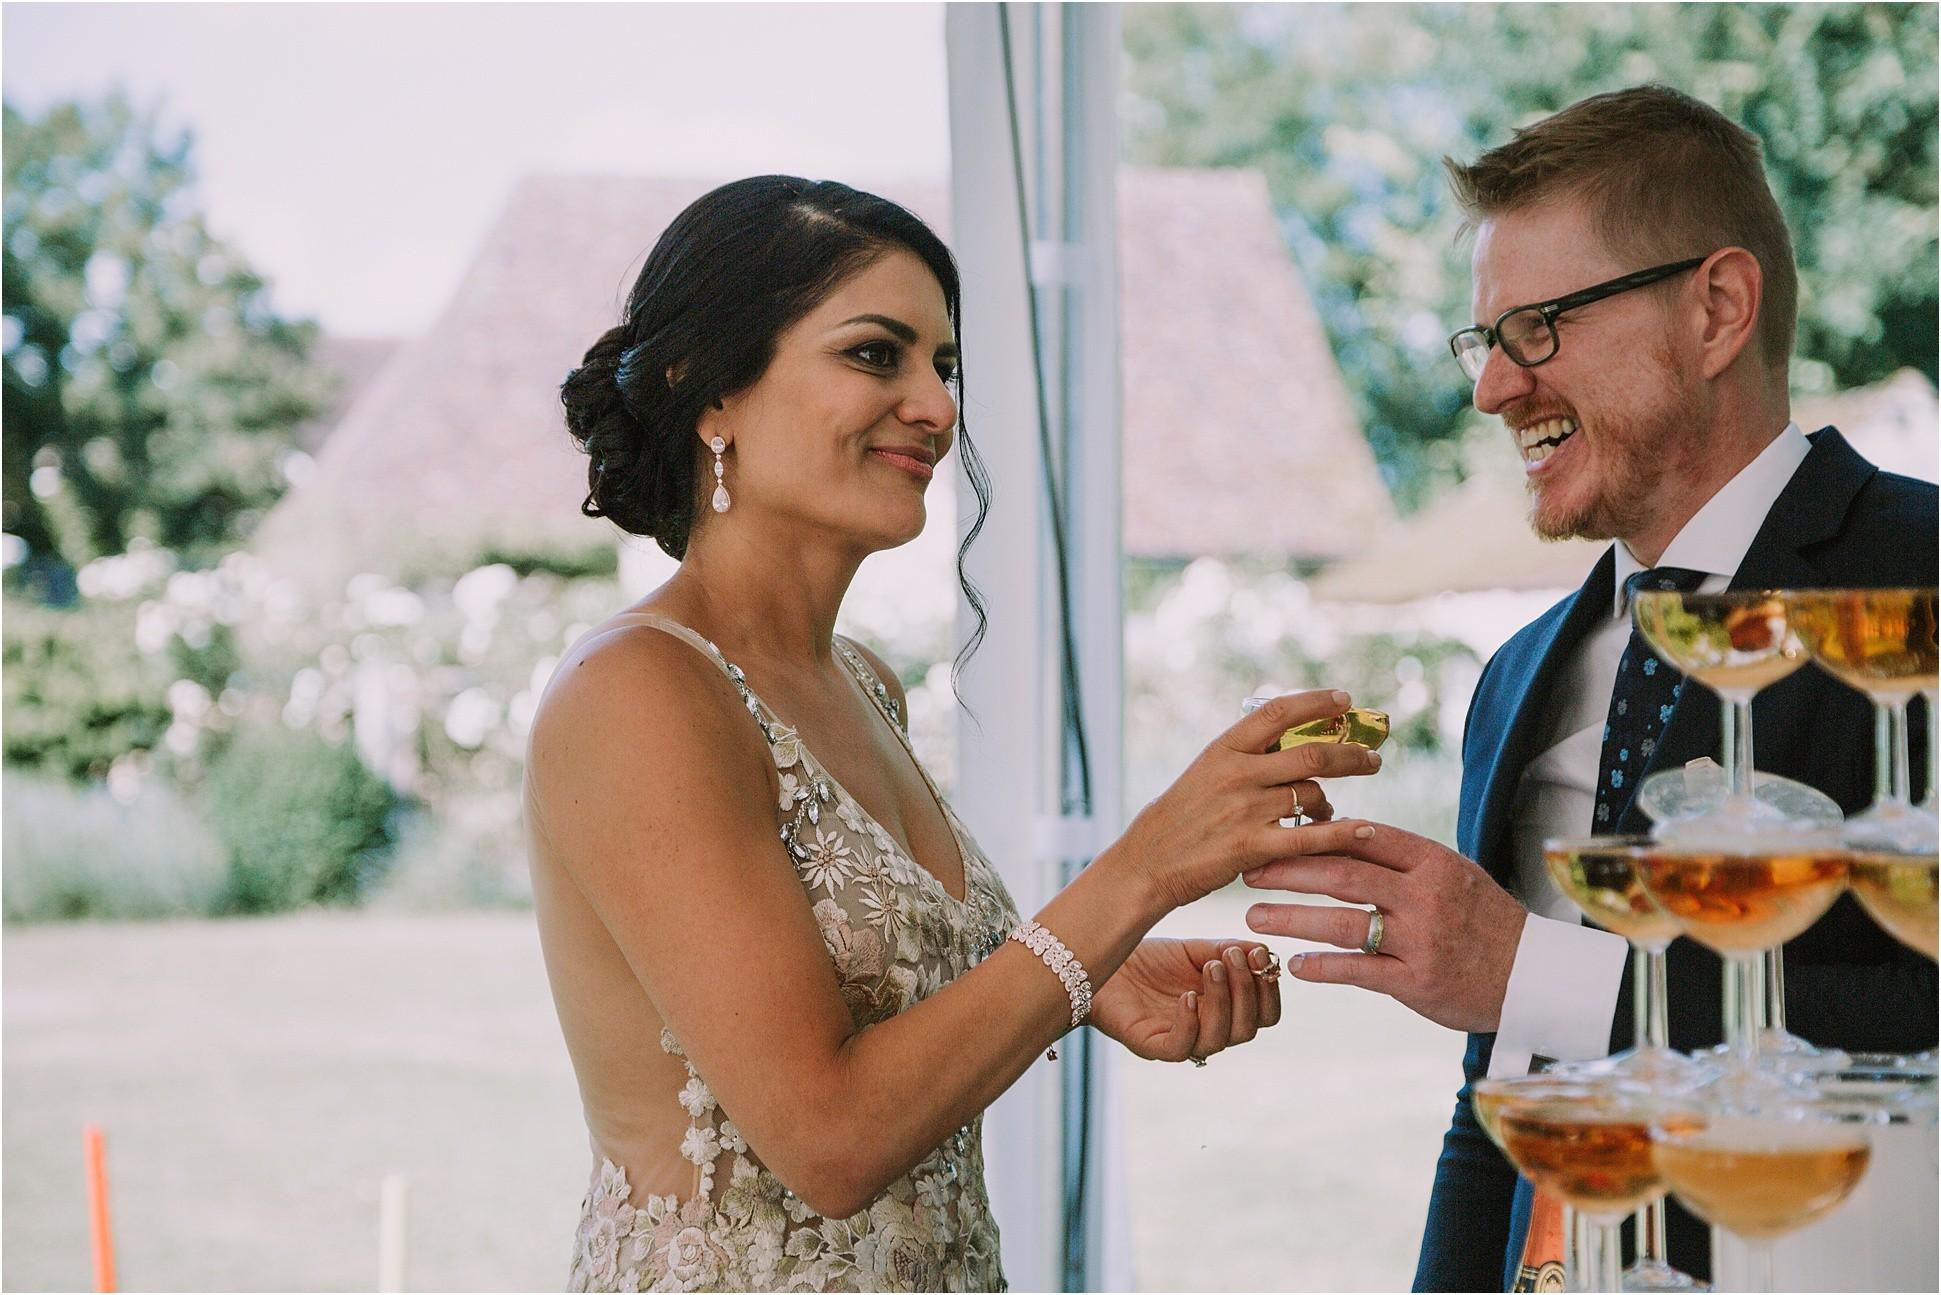 Kateryna-photos-photographe-mariage-chateau-st-paterne-mayenne-normandie_0145.jpg